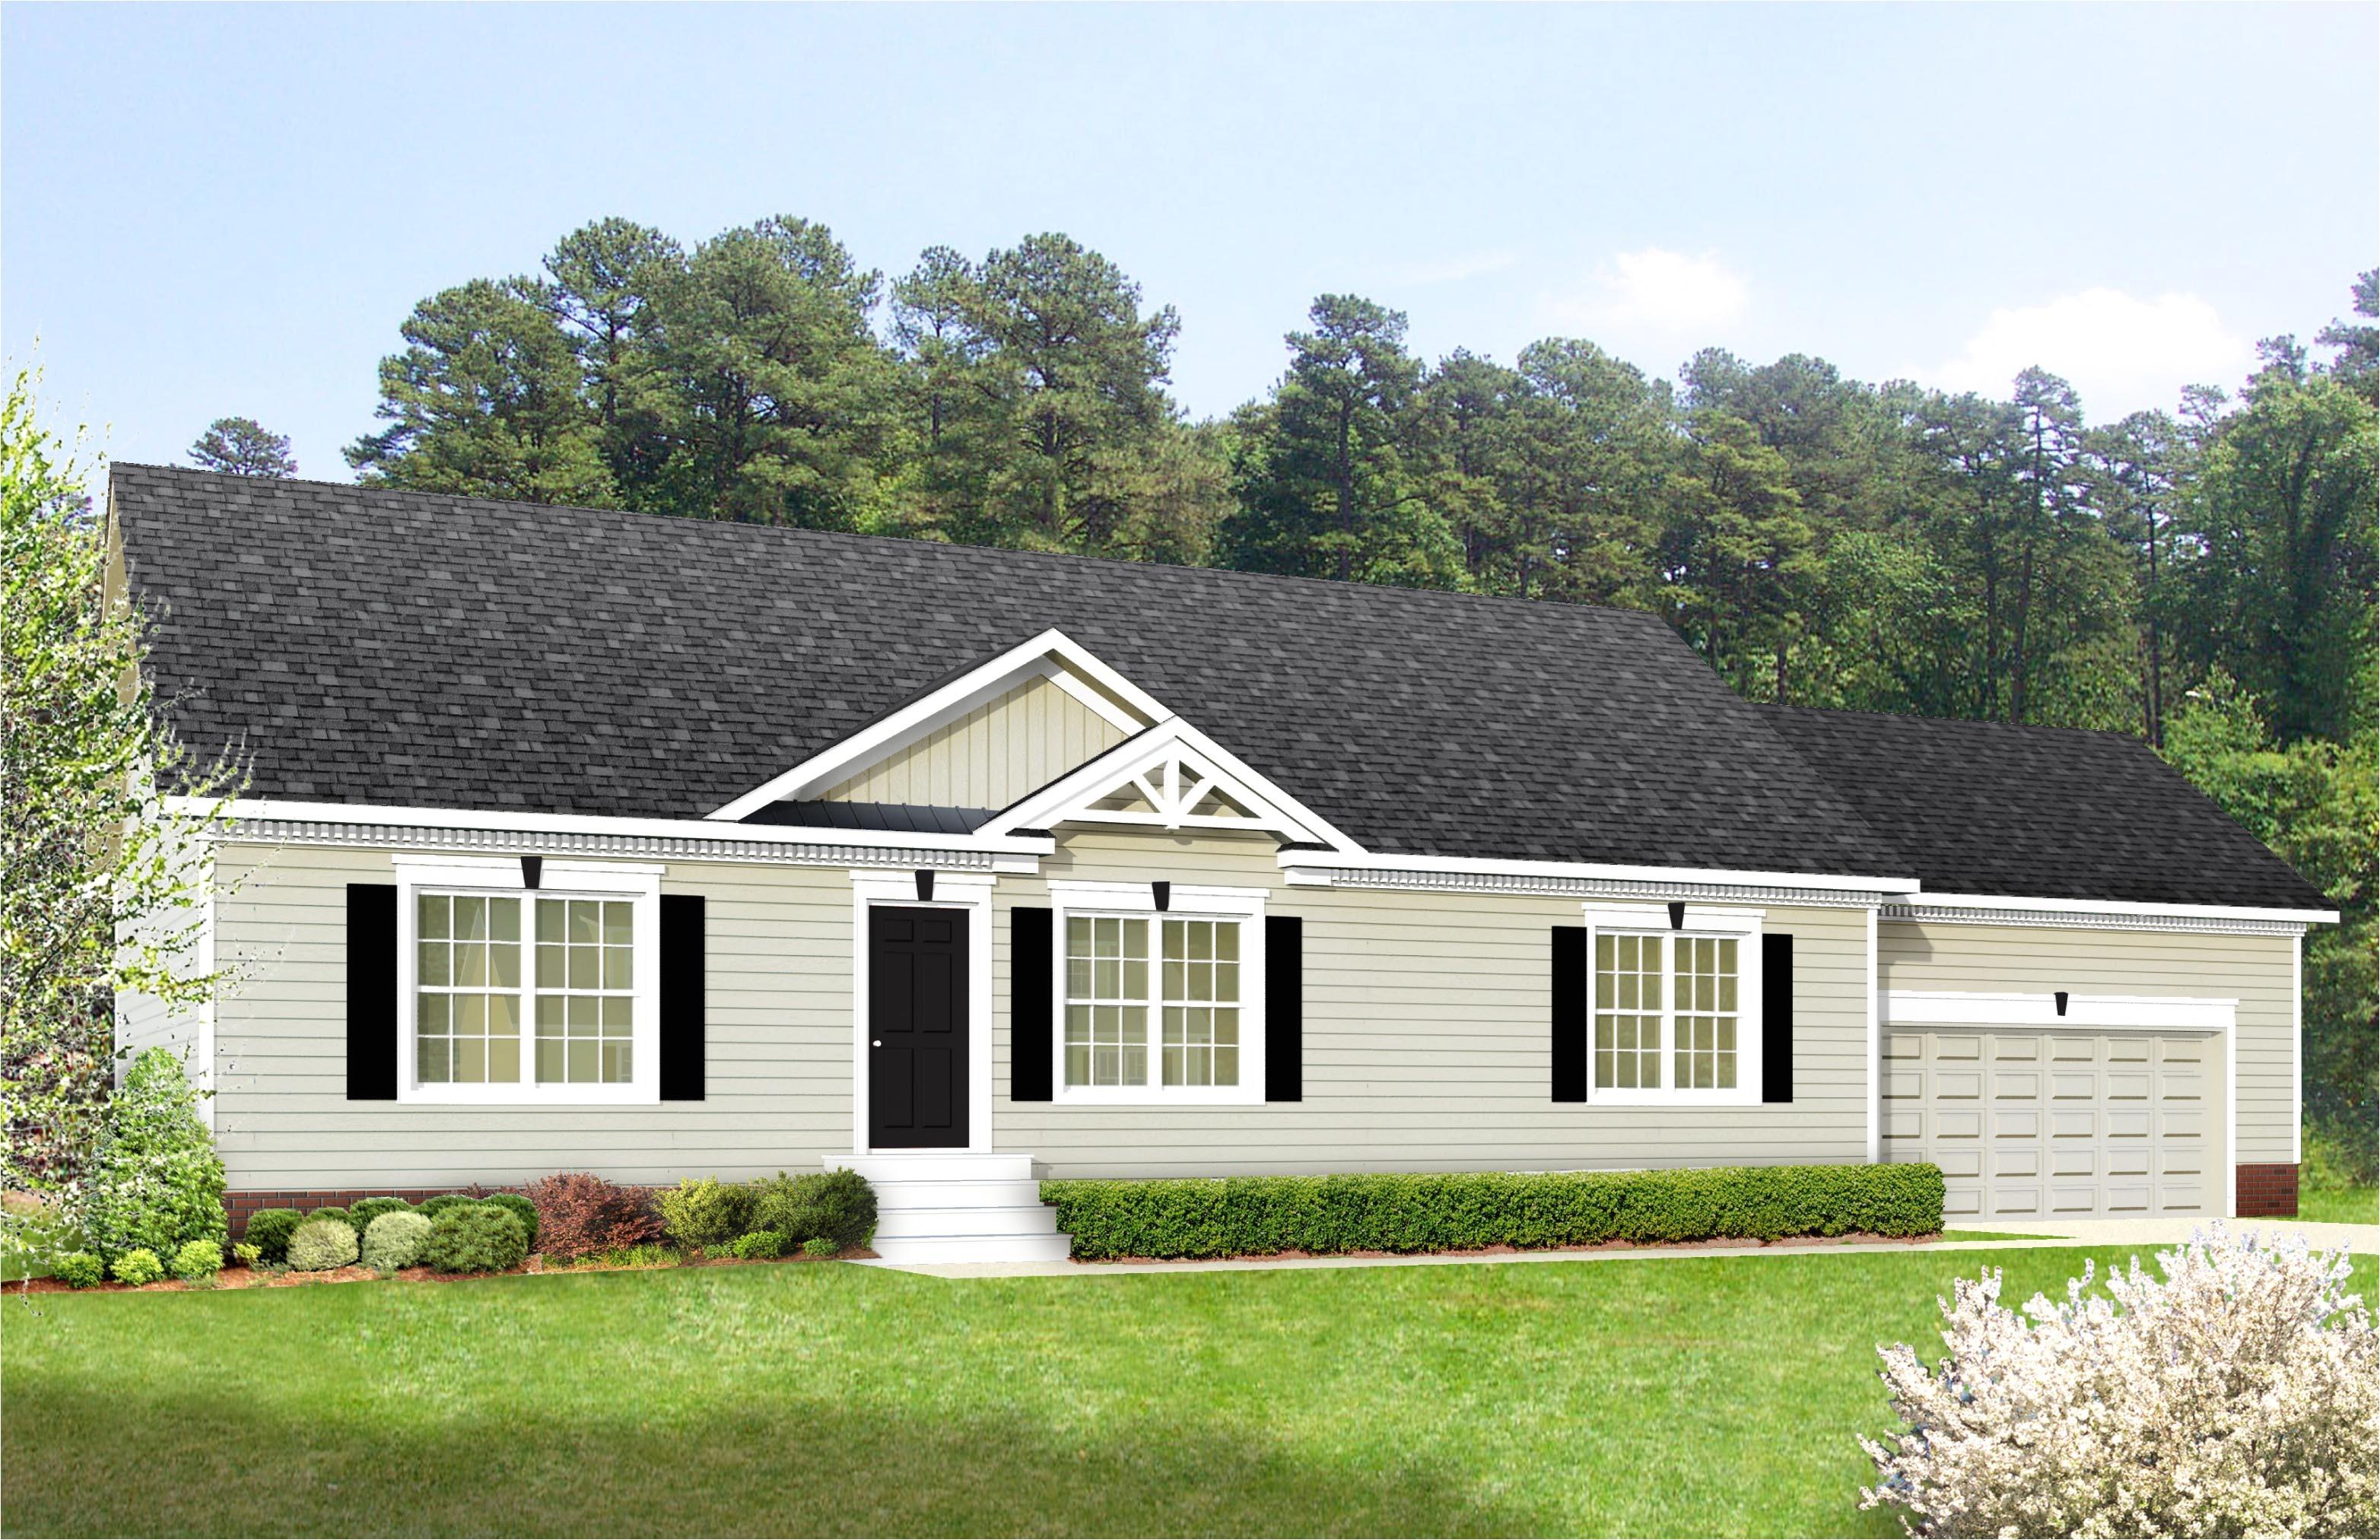 cost of modular home exterior contemporary design idea of tritmonk modular house photo gallery pack cardinal greensboro in pa pratt